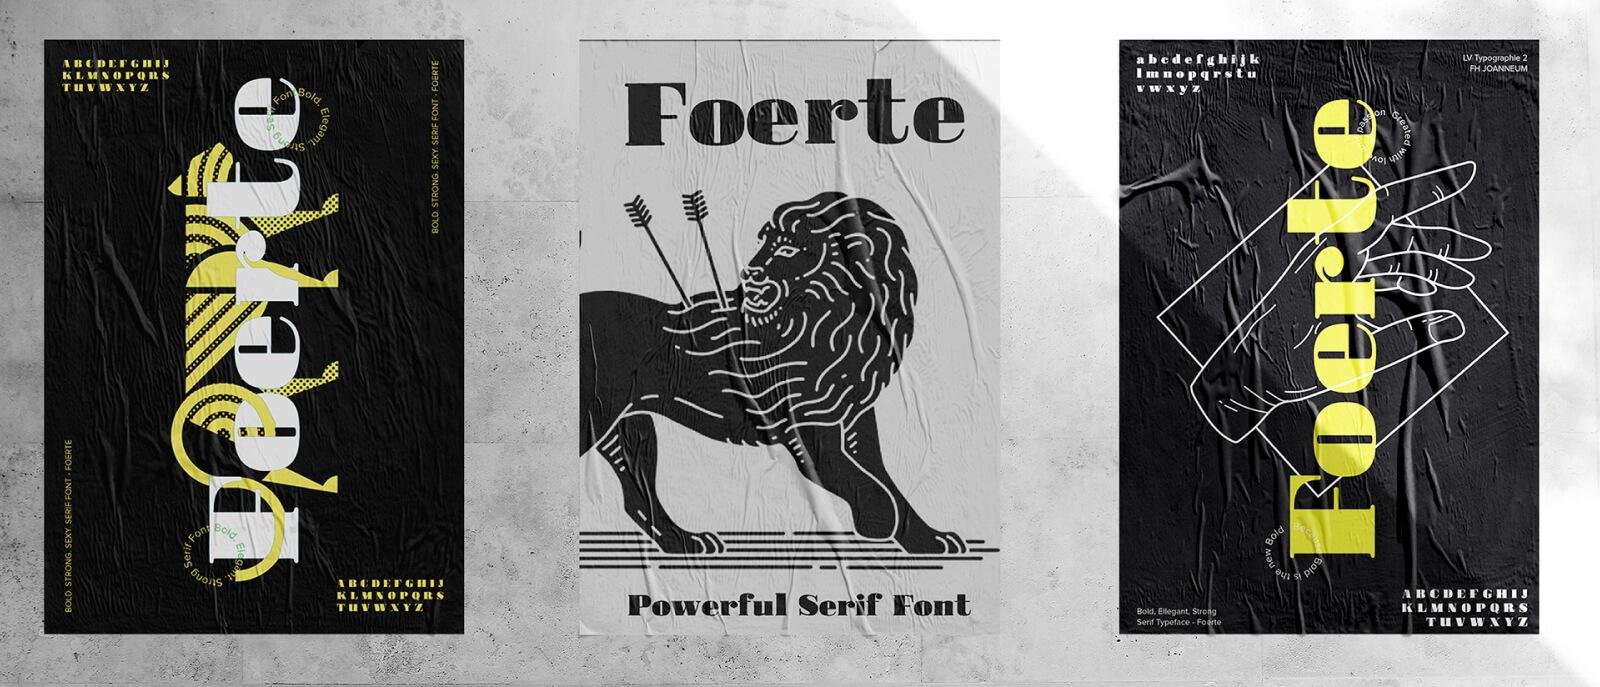 Foerte: a bold, powerful and yet elegant sans serif font